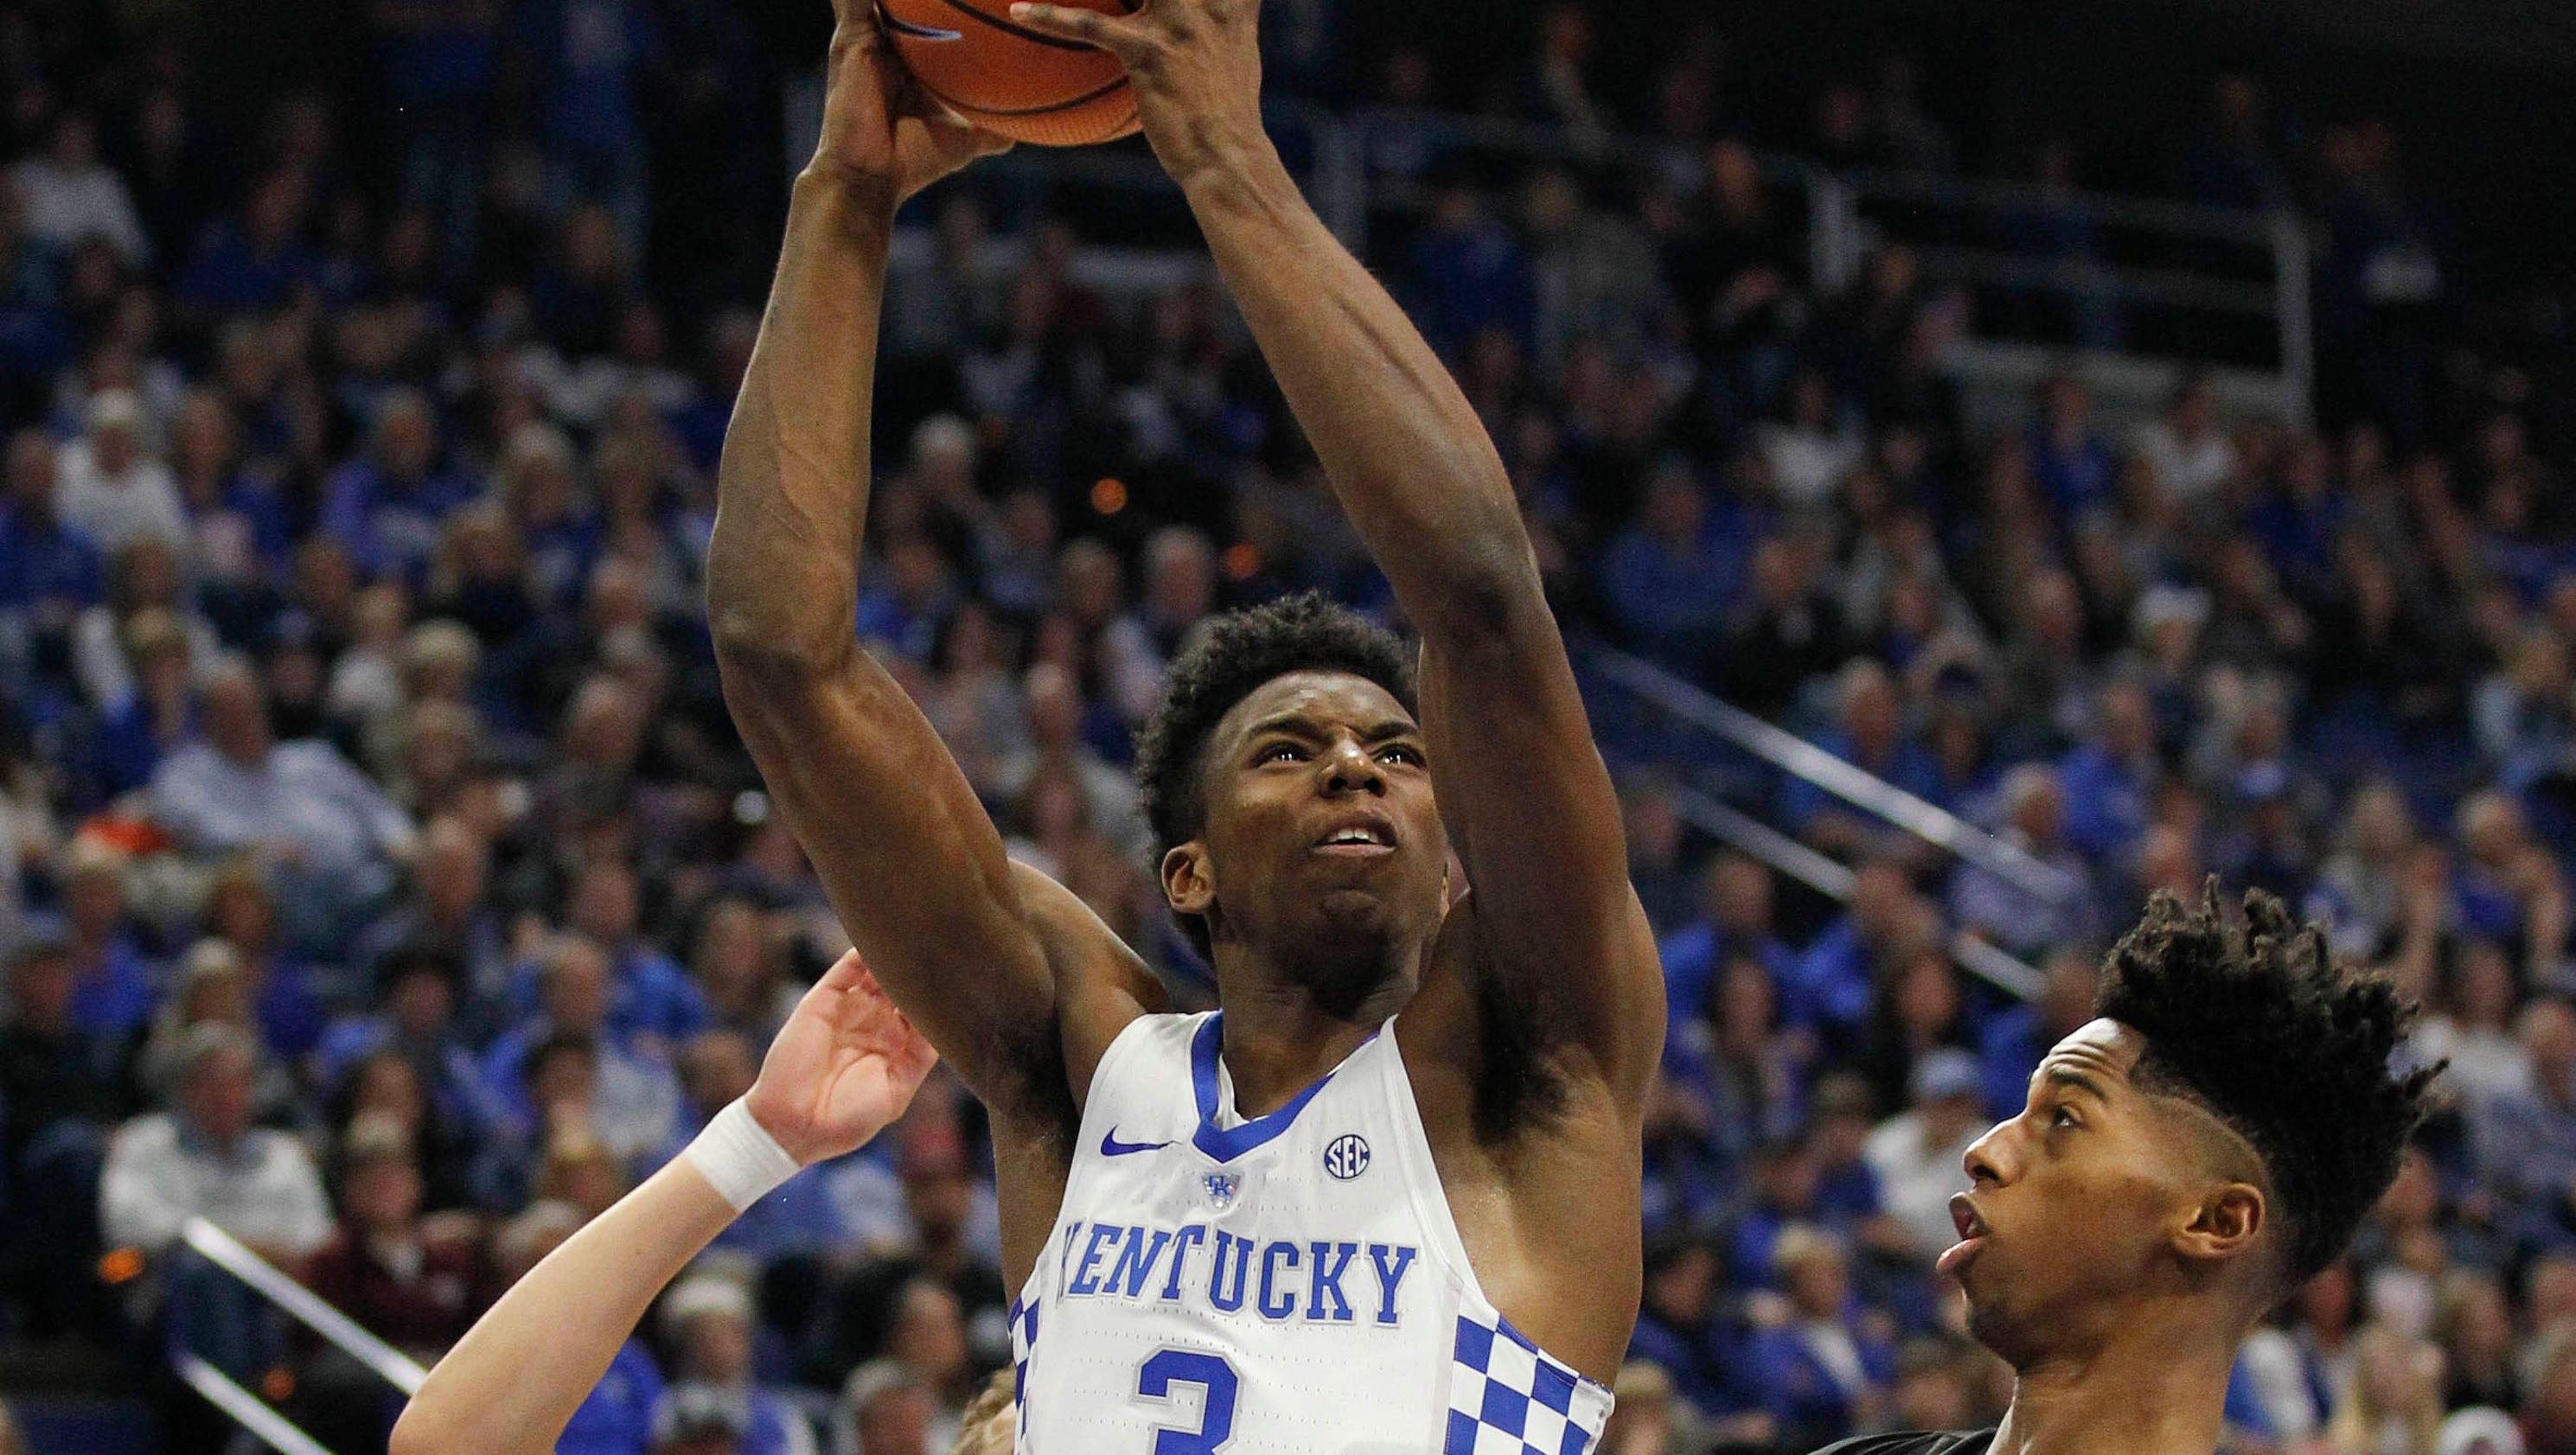 How To Watch Uk Basketball Play Etsu Game Time Tv: Kentucky Basketball: How To Watch UK Game Vs. Virginia Tech